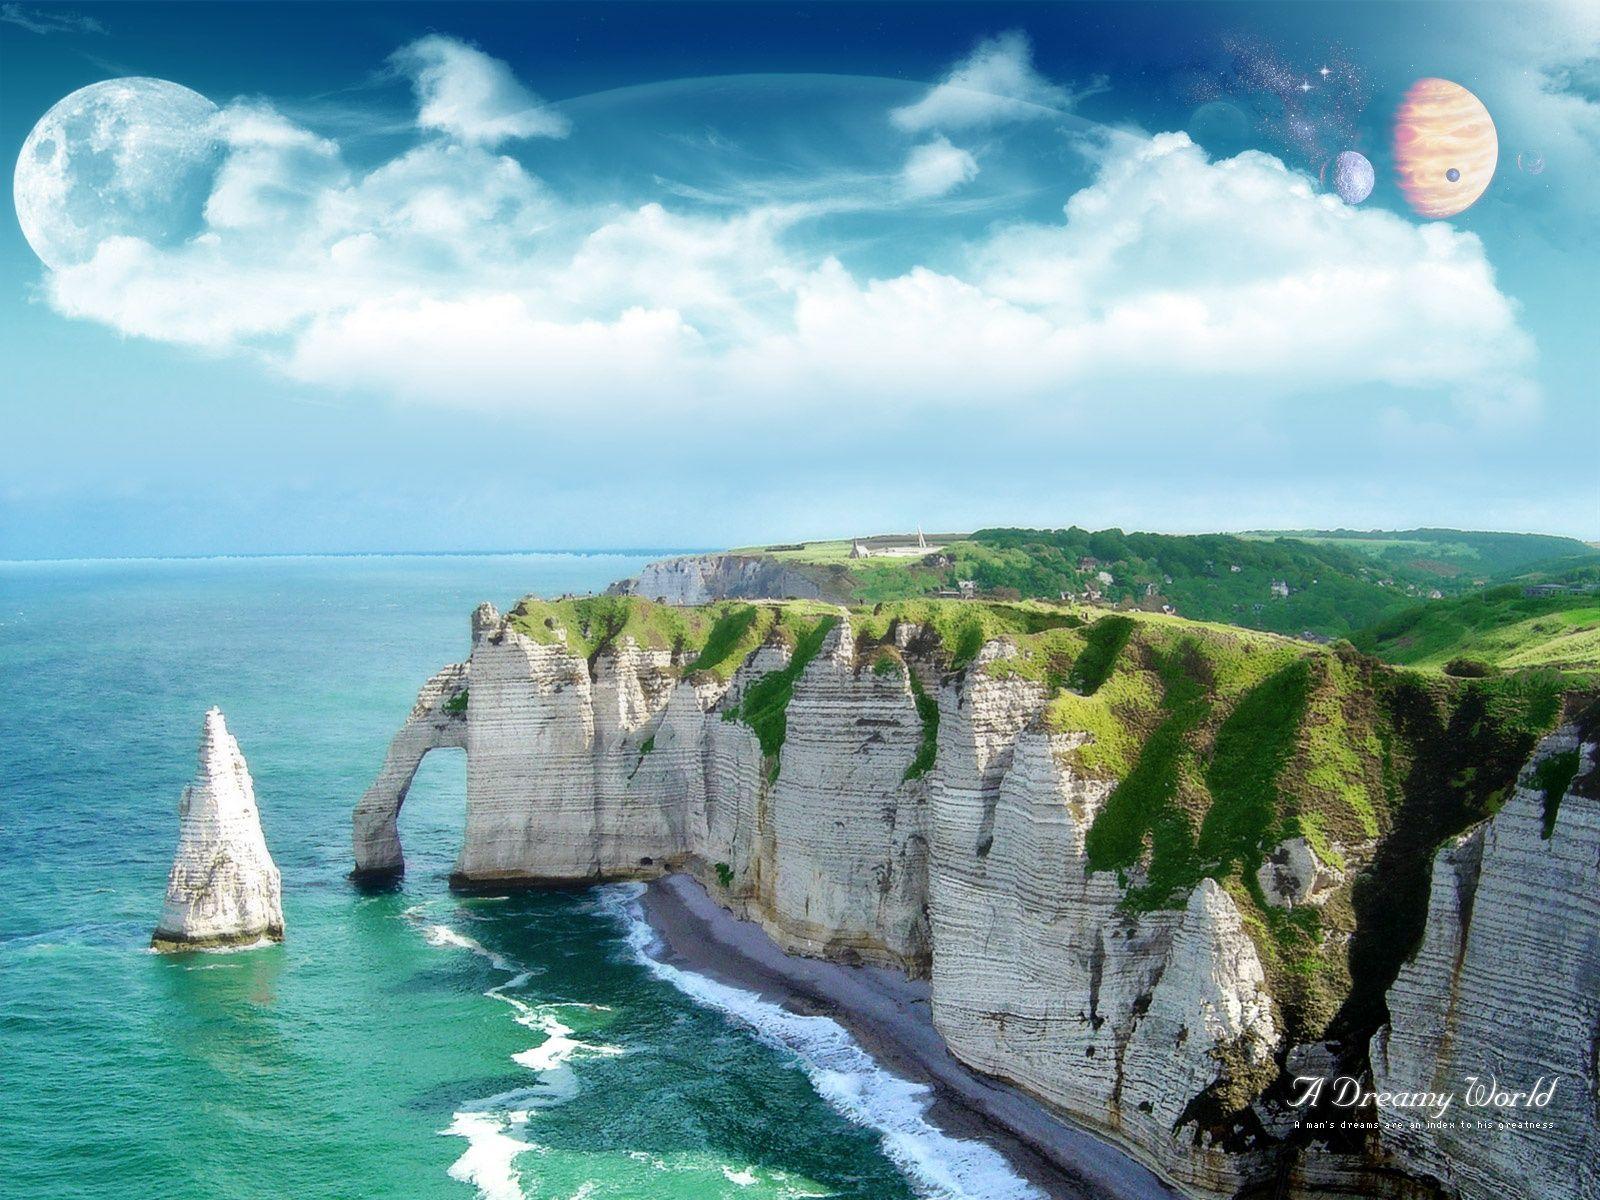 Pin By Tereza On Nature S Magic Beautiful Landscape Wallpaper World Wallpaper Landscape Wallpaper